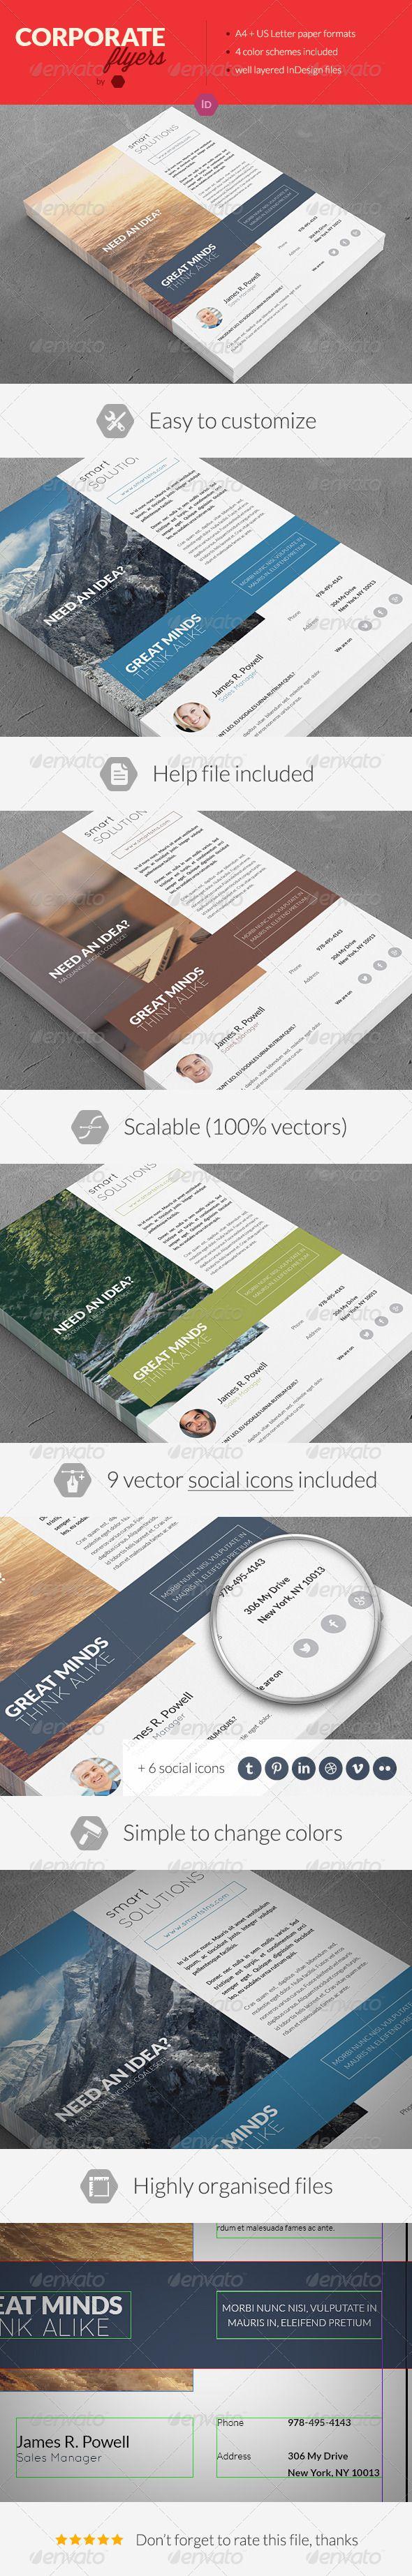 Clean Corporate Multipurpose Flyers / Magazine Ads - Print Templates